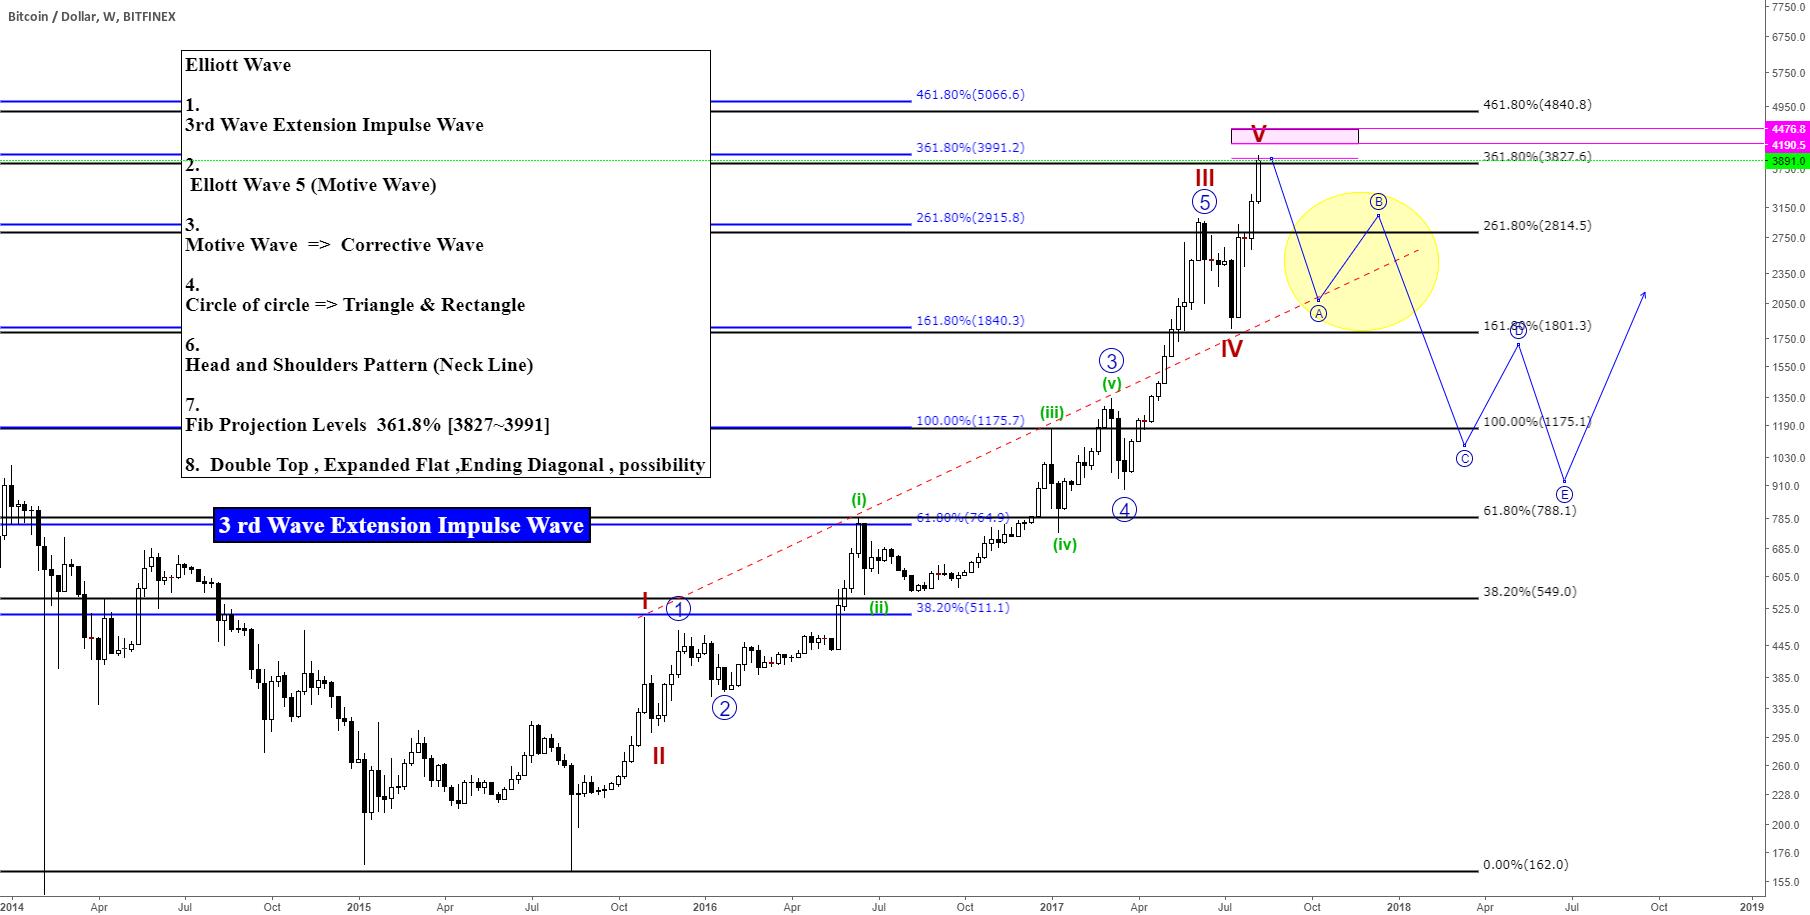 BTCUSDT/BTCUSD/ Bitcoin Elliott Wave 3rd Wave Extension Impulse